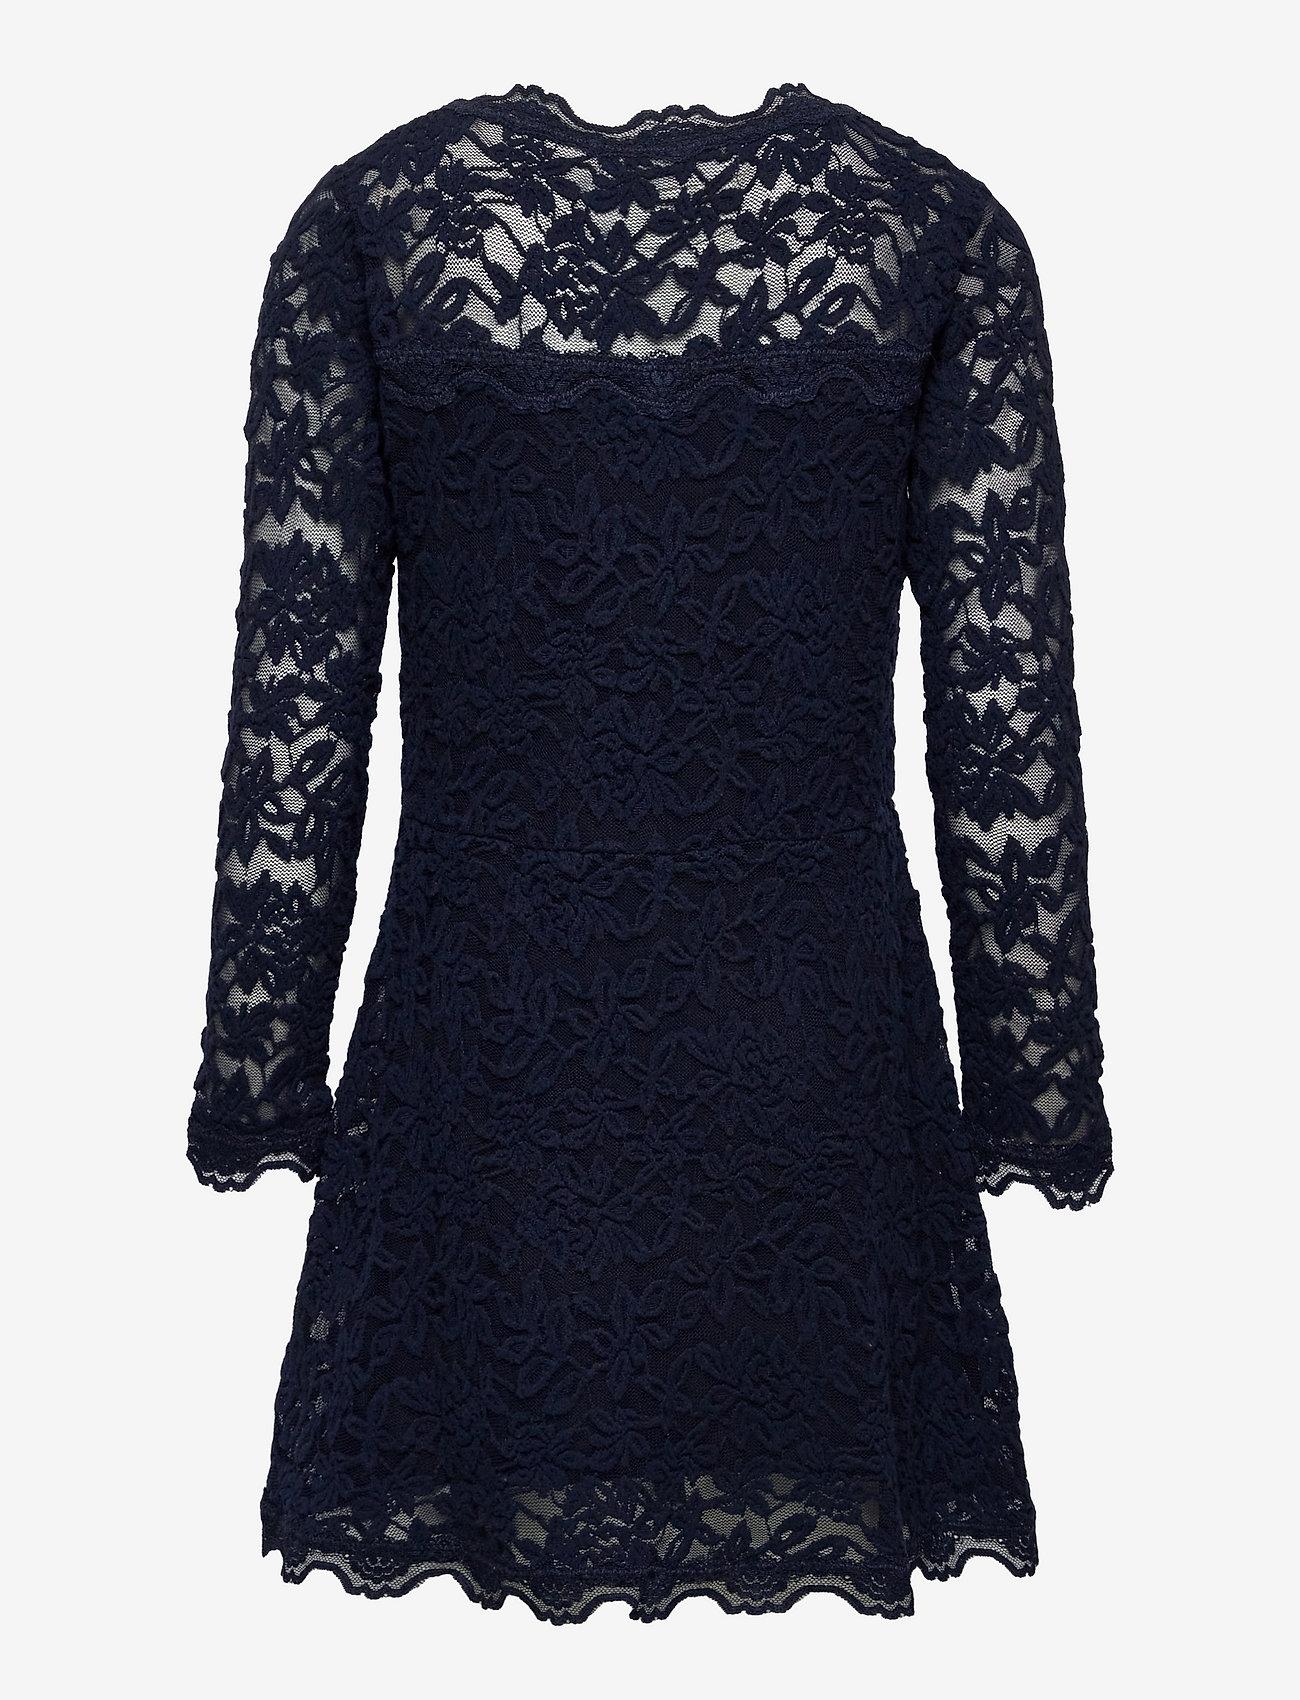 Rosemunde Kids - Dress ls - kleider - dark blue - 1